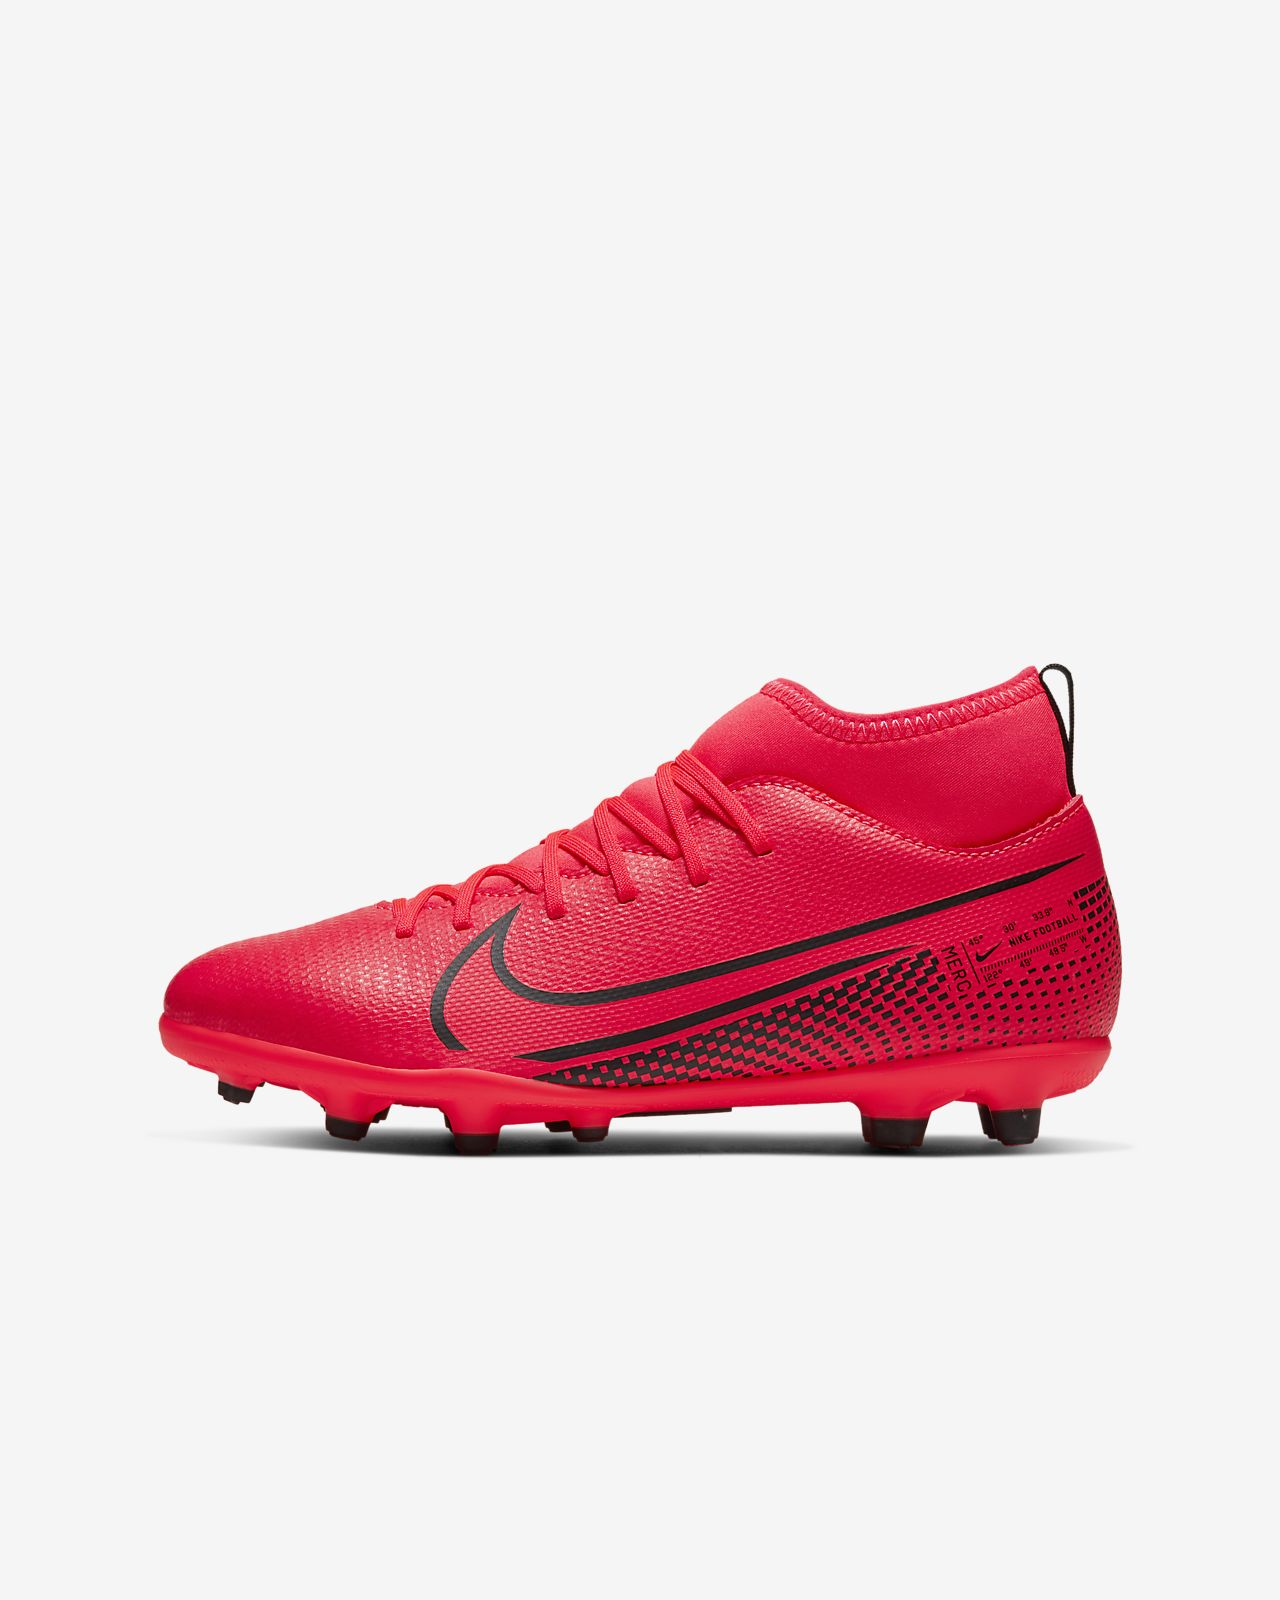 Nike Hypervenom Size 2 (US) Football Boots | Kids Clothing